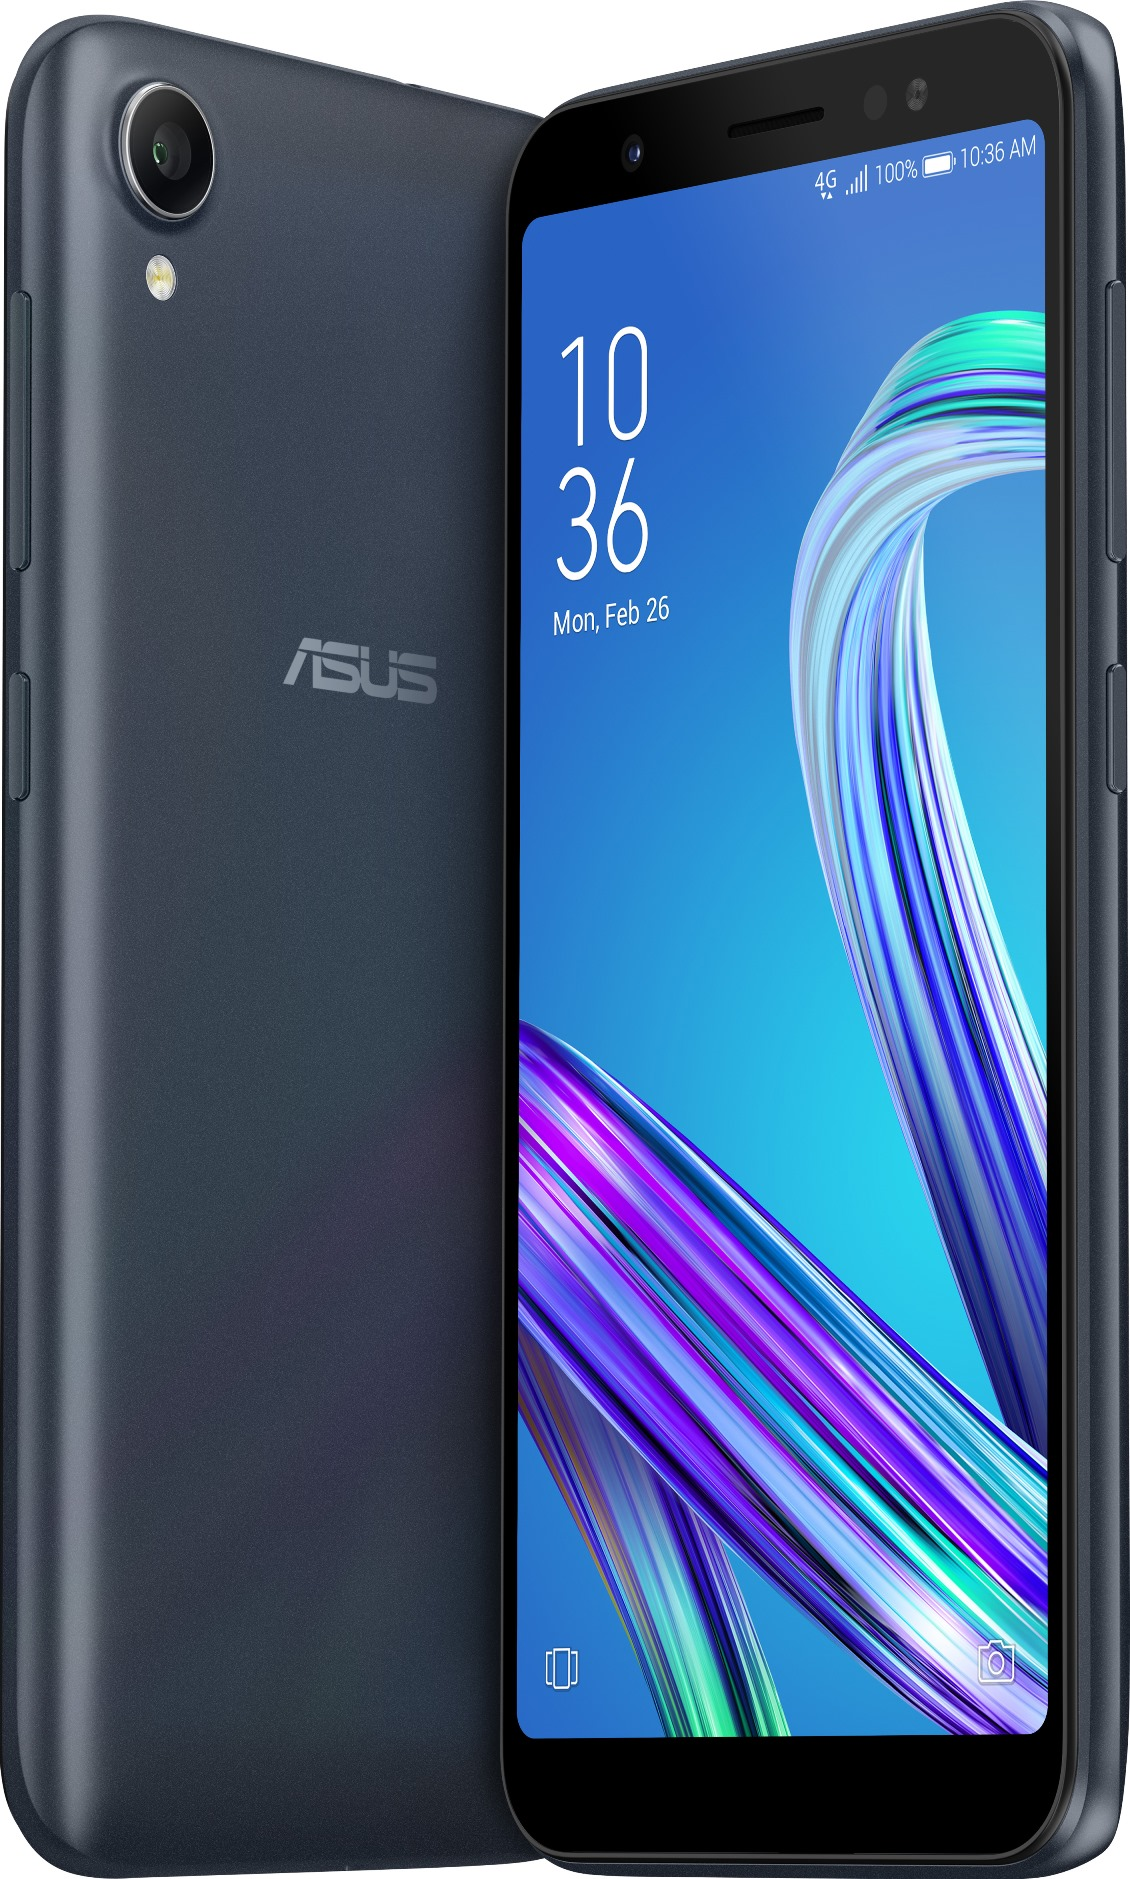 ASUS Zenfone LIVE - MSM8917/16GB/2G/Android 8.0 černý (CZ Distribuce)